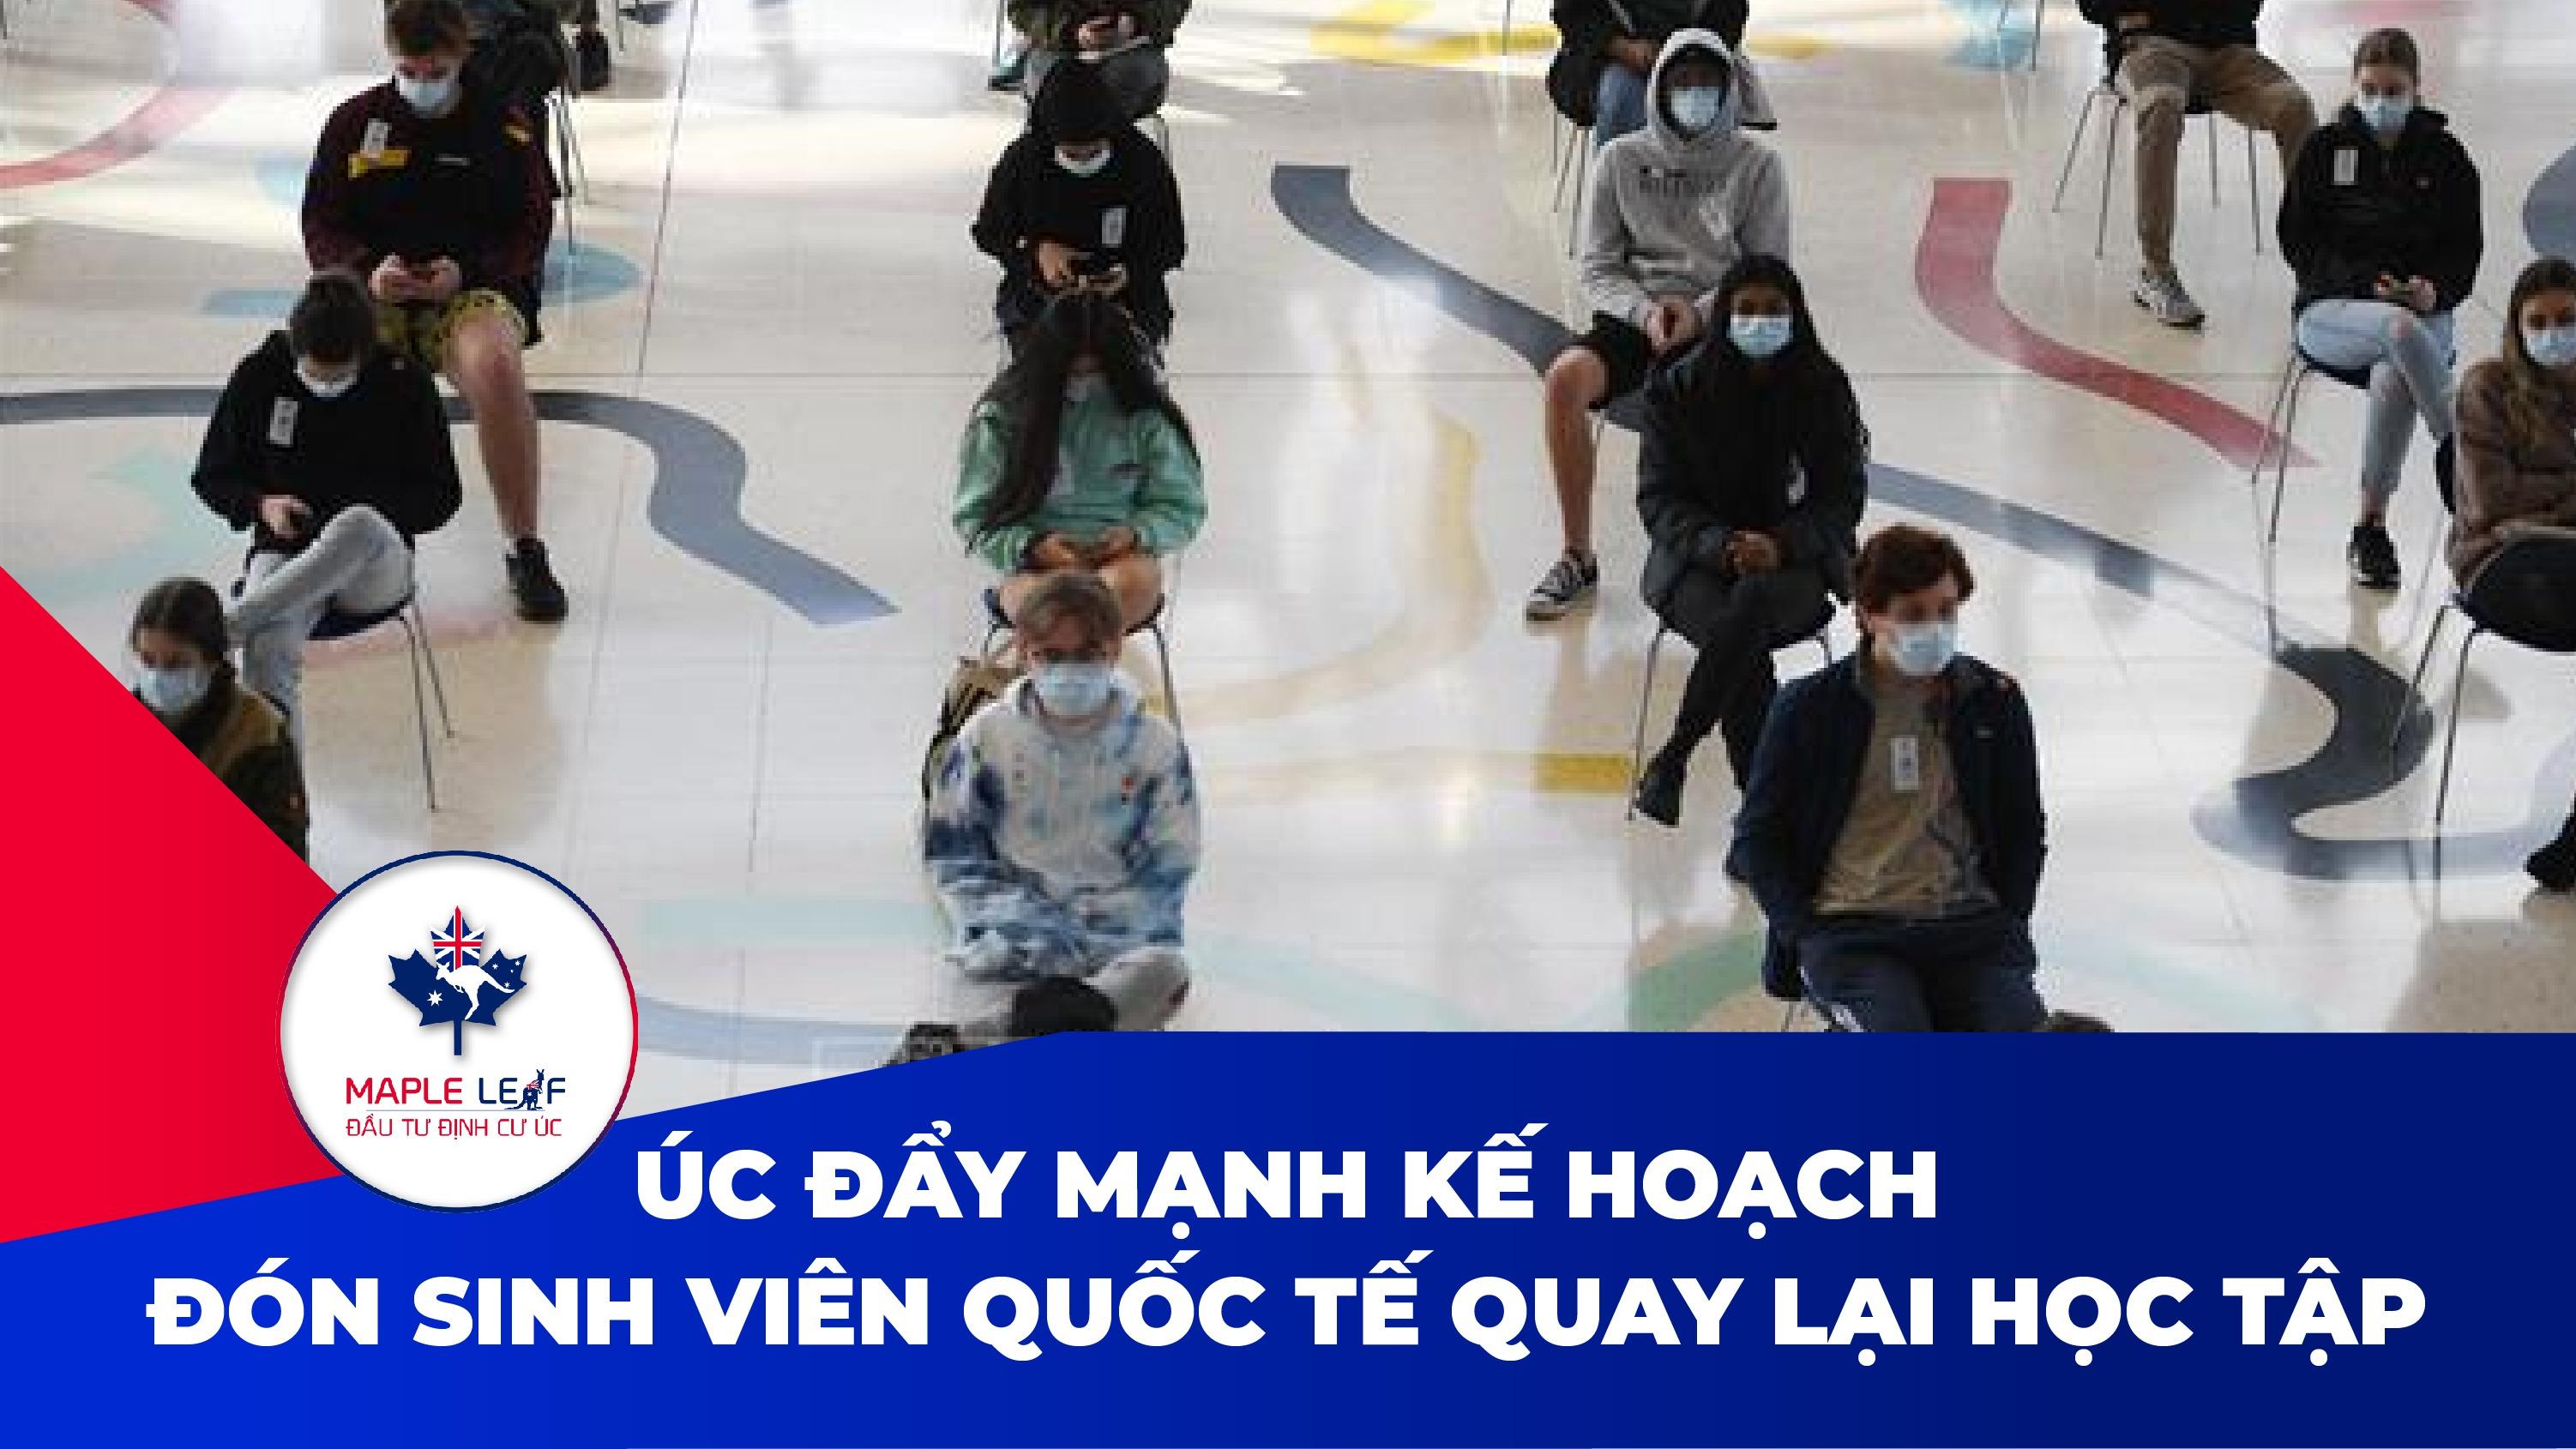 uc-day-manh-ke-hoach-don-sinh-vien-quoc-te-quay-lai-hoc-tap